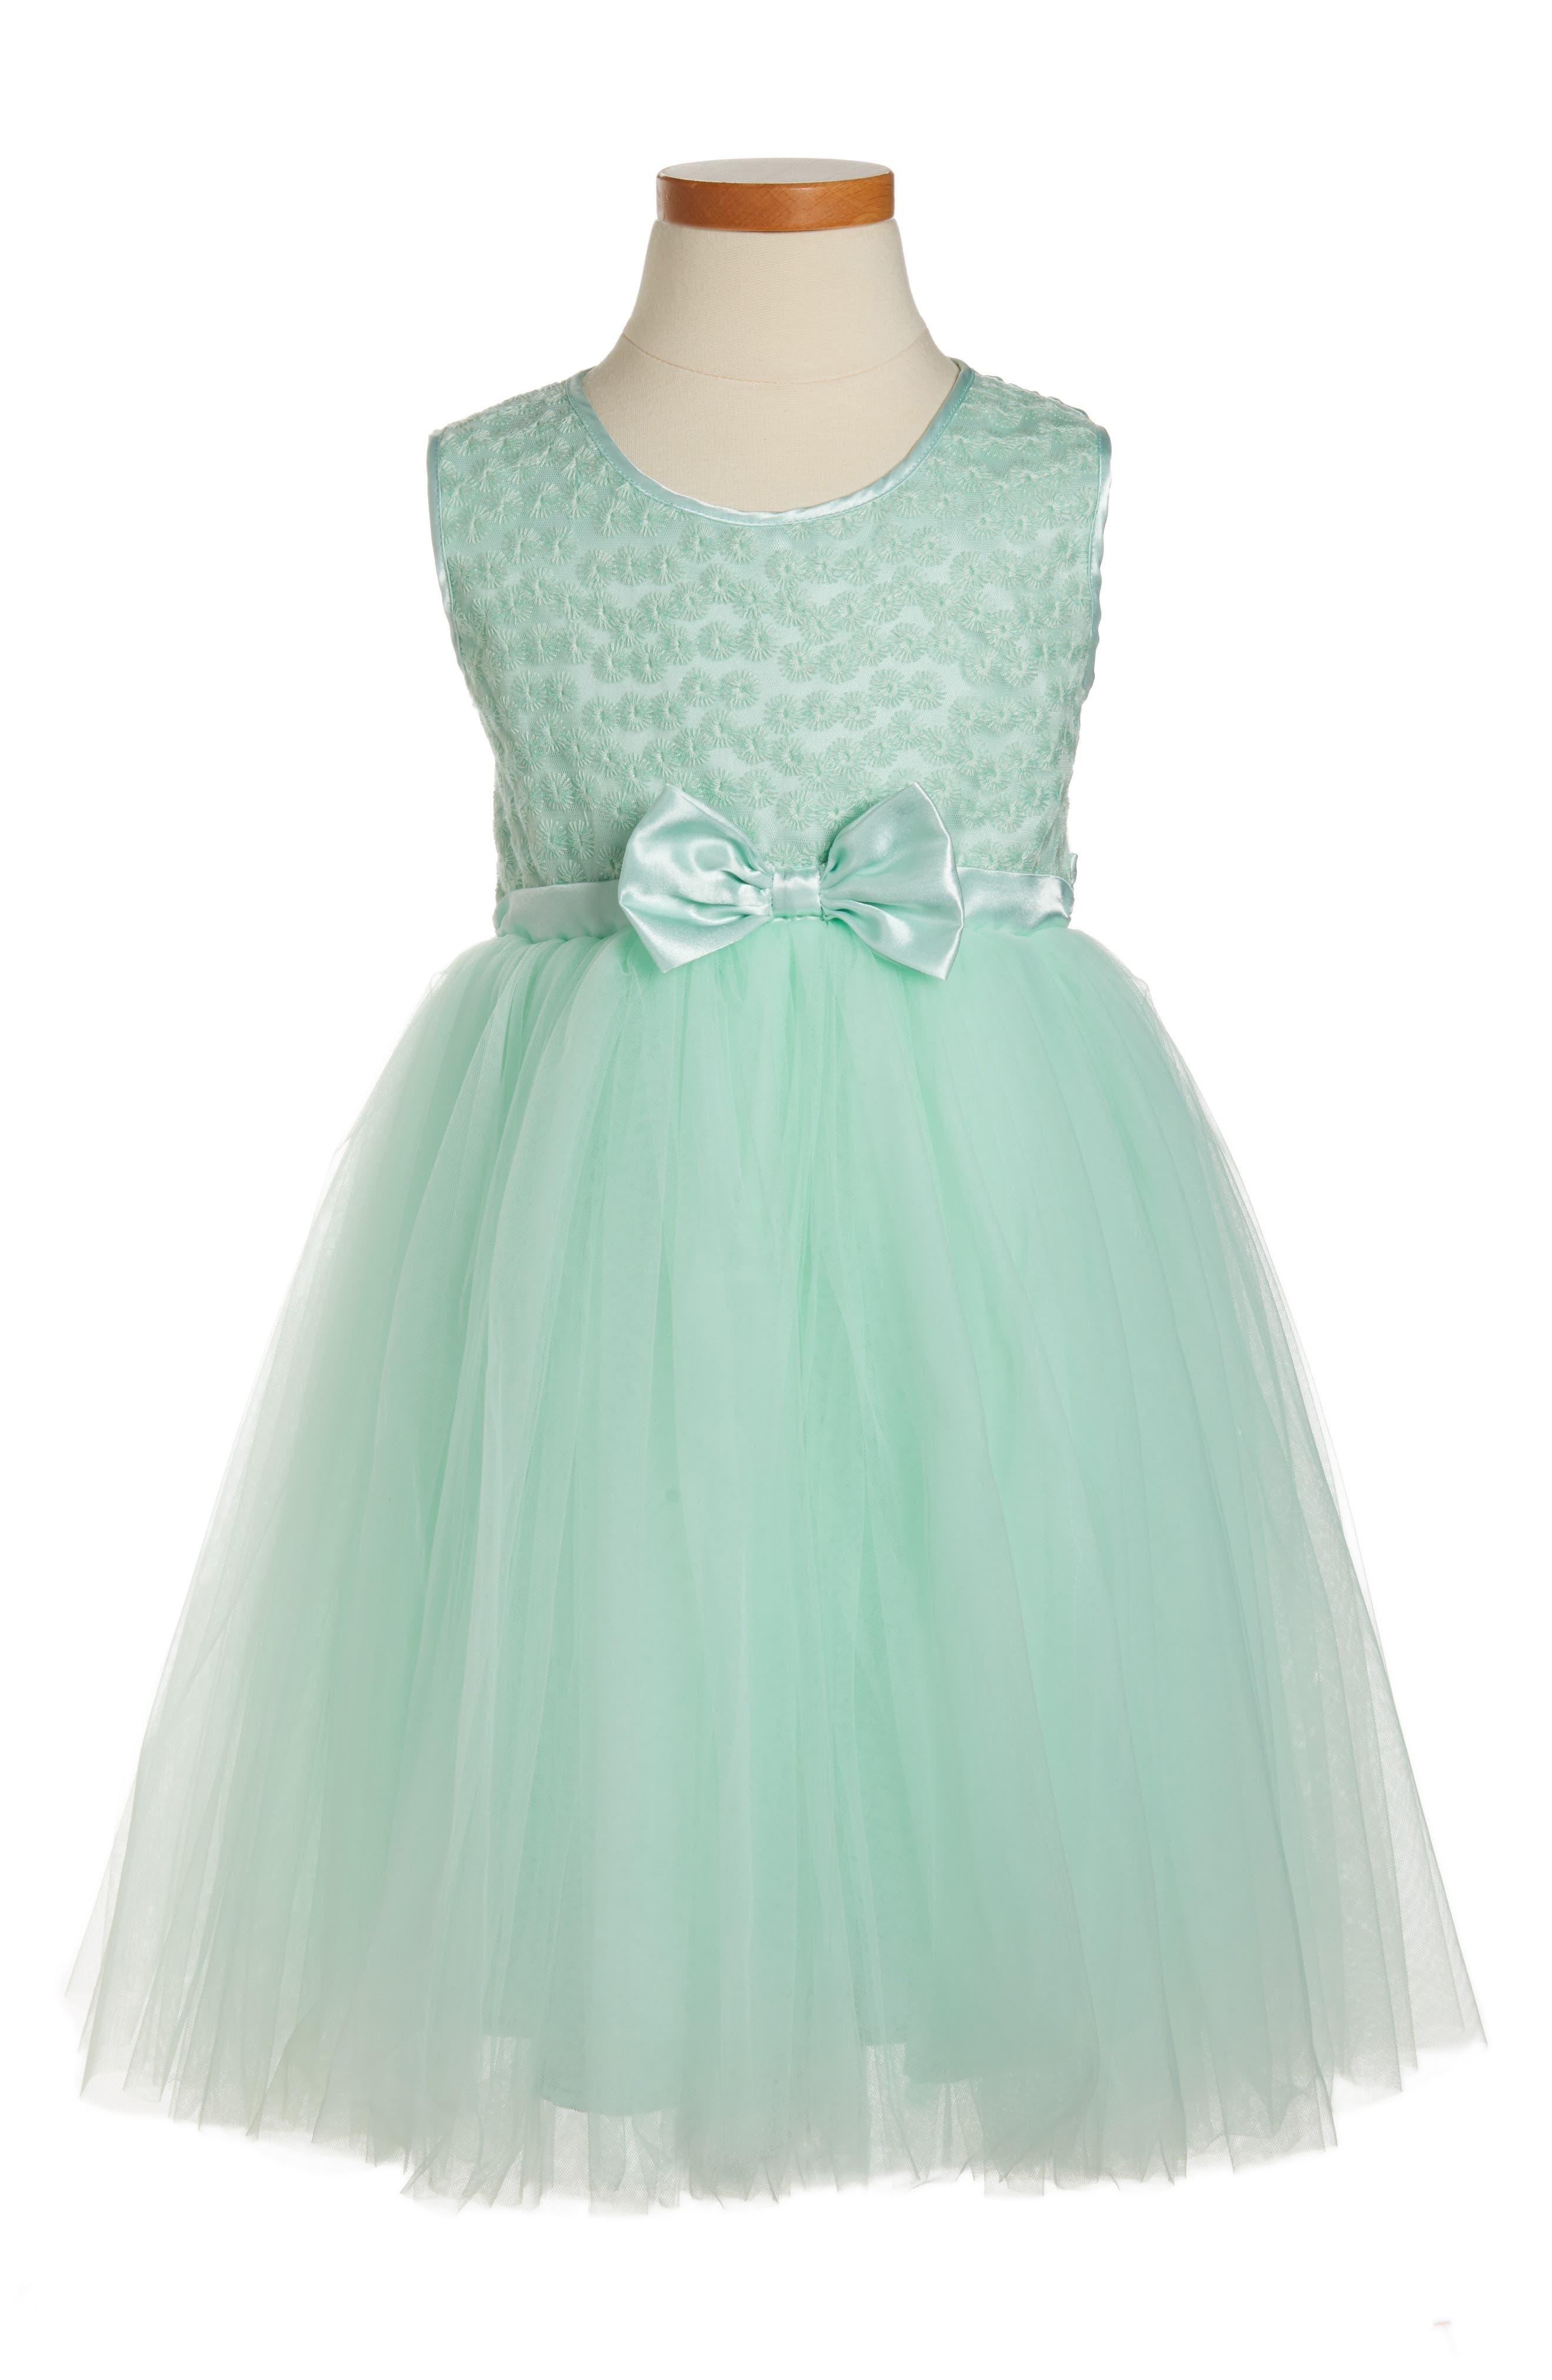 Main Image - Popatu Princess Sleeveless Dress (Toddler Girls, Little Girls & Big Girls)